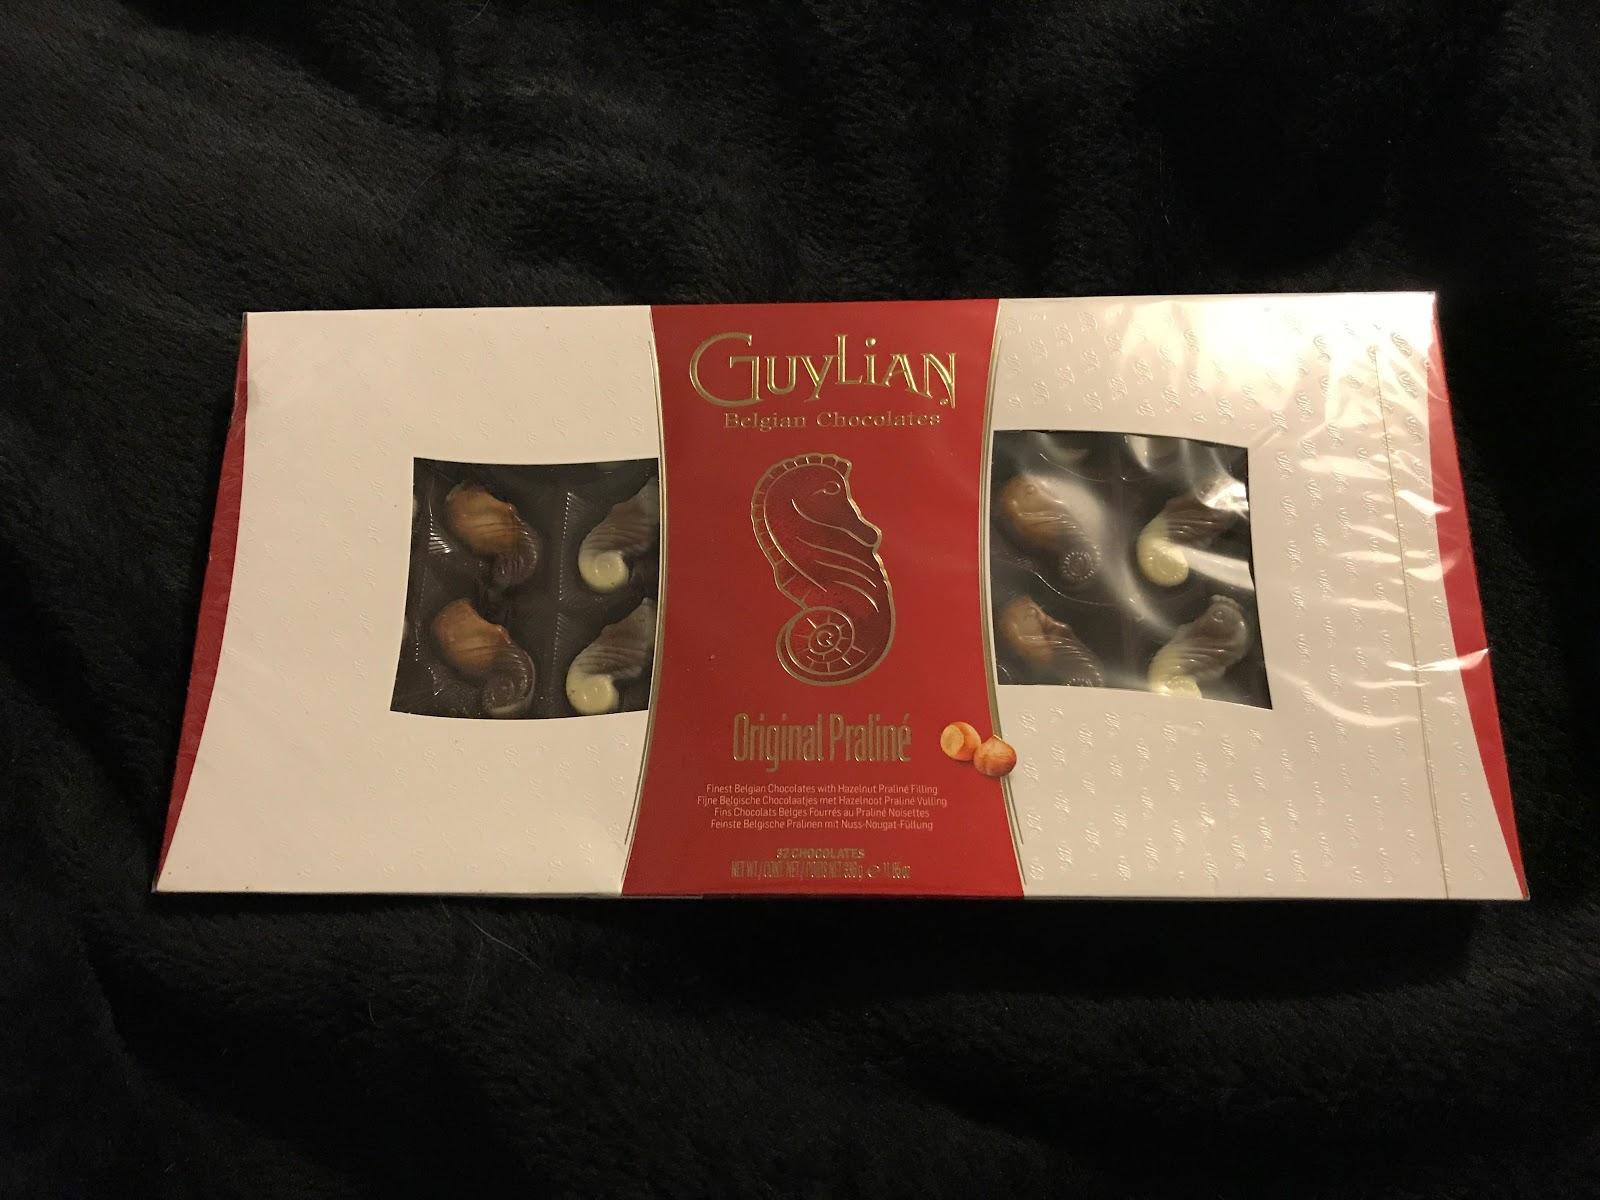 Guylian Seahorse chocolates